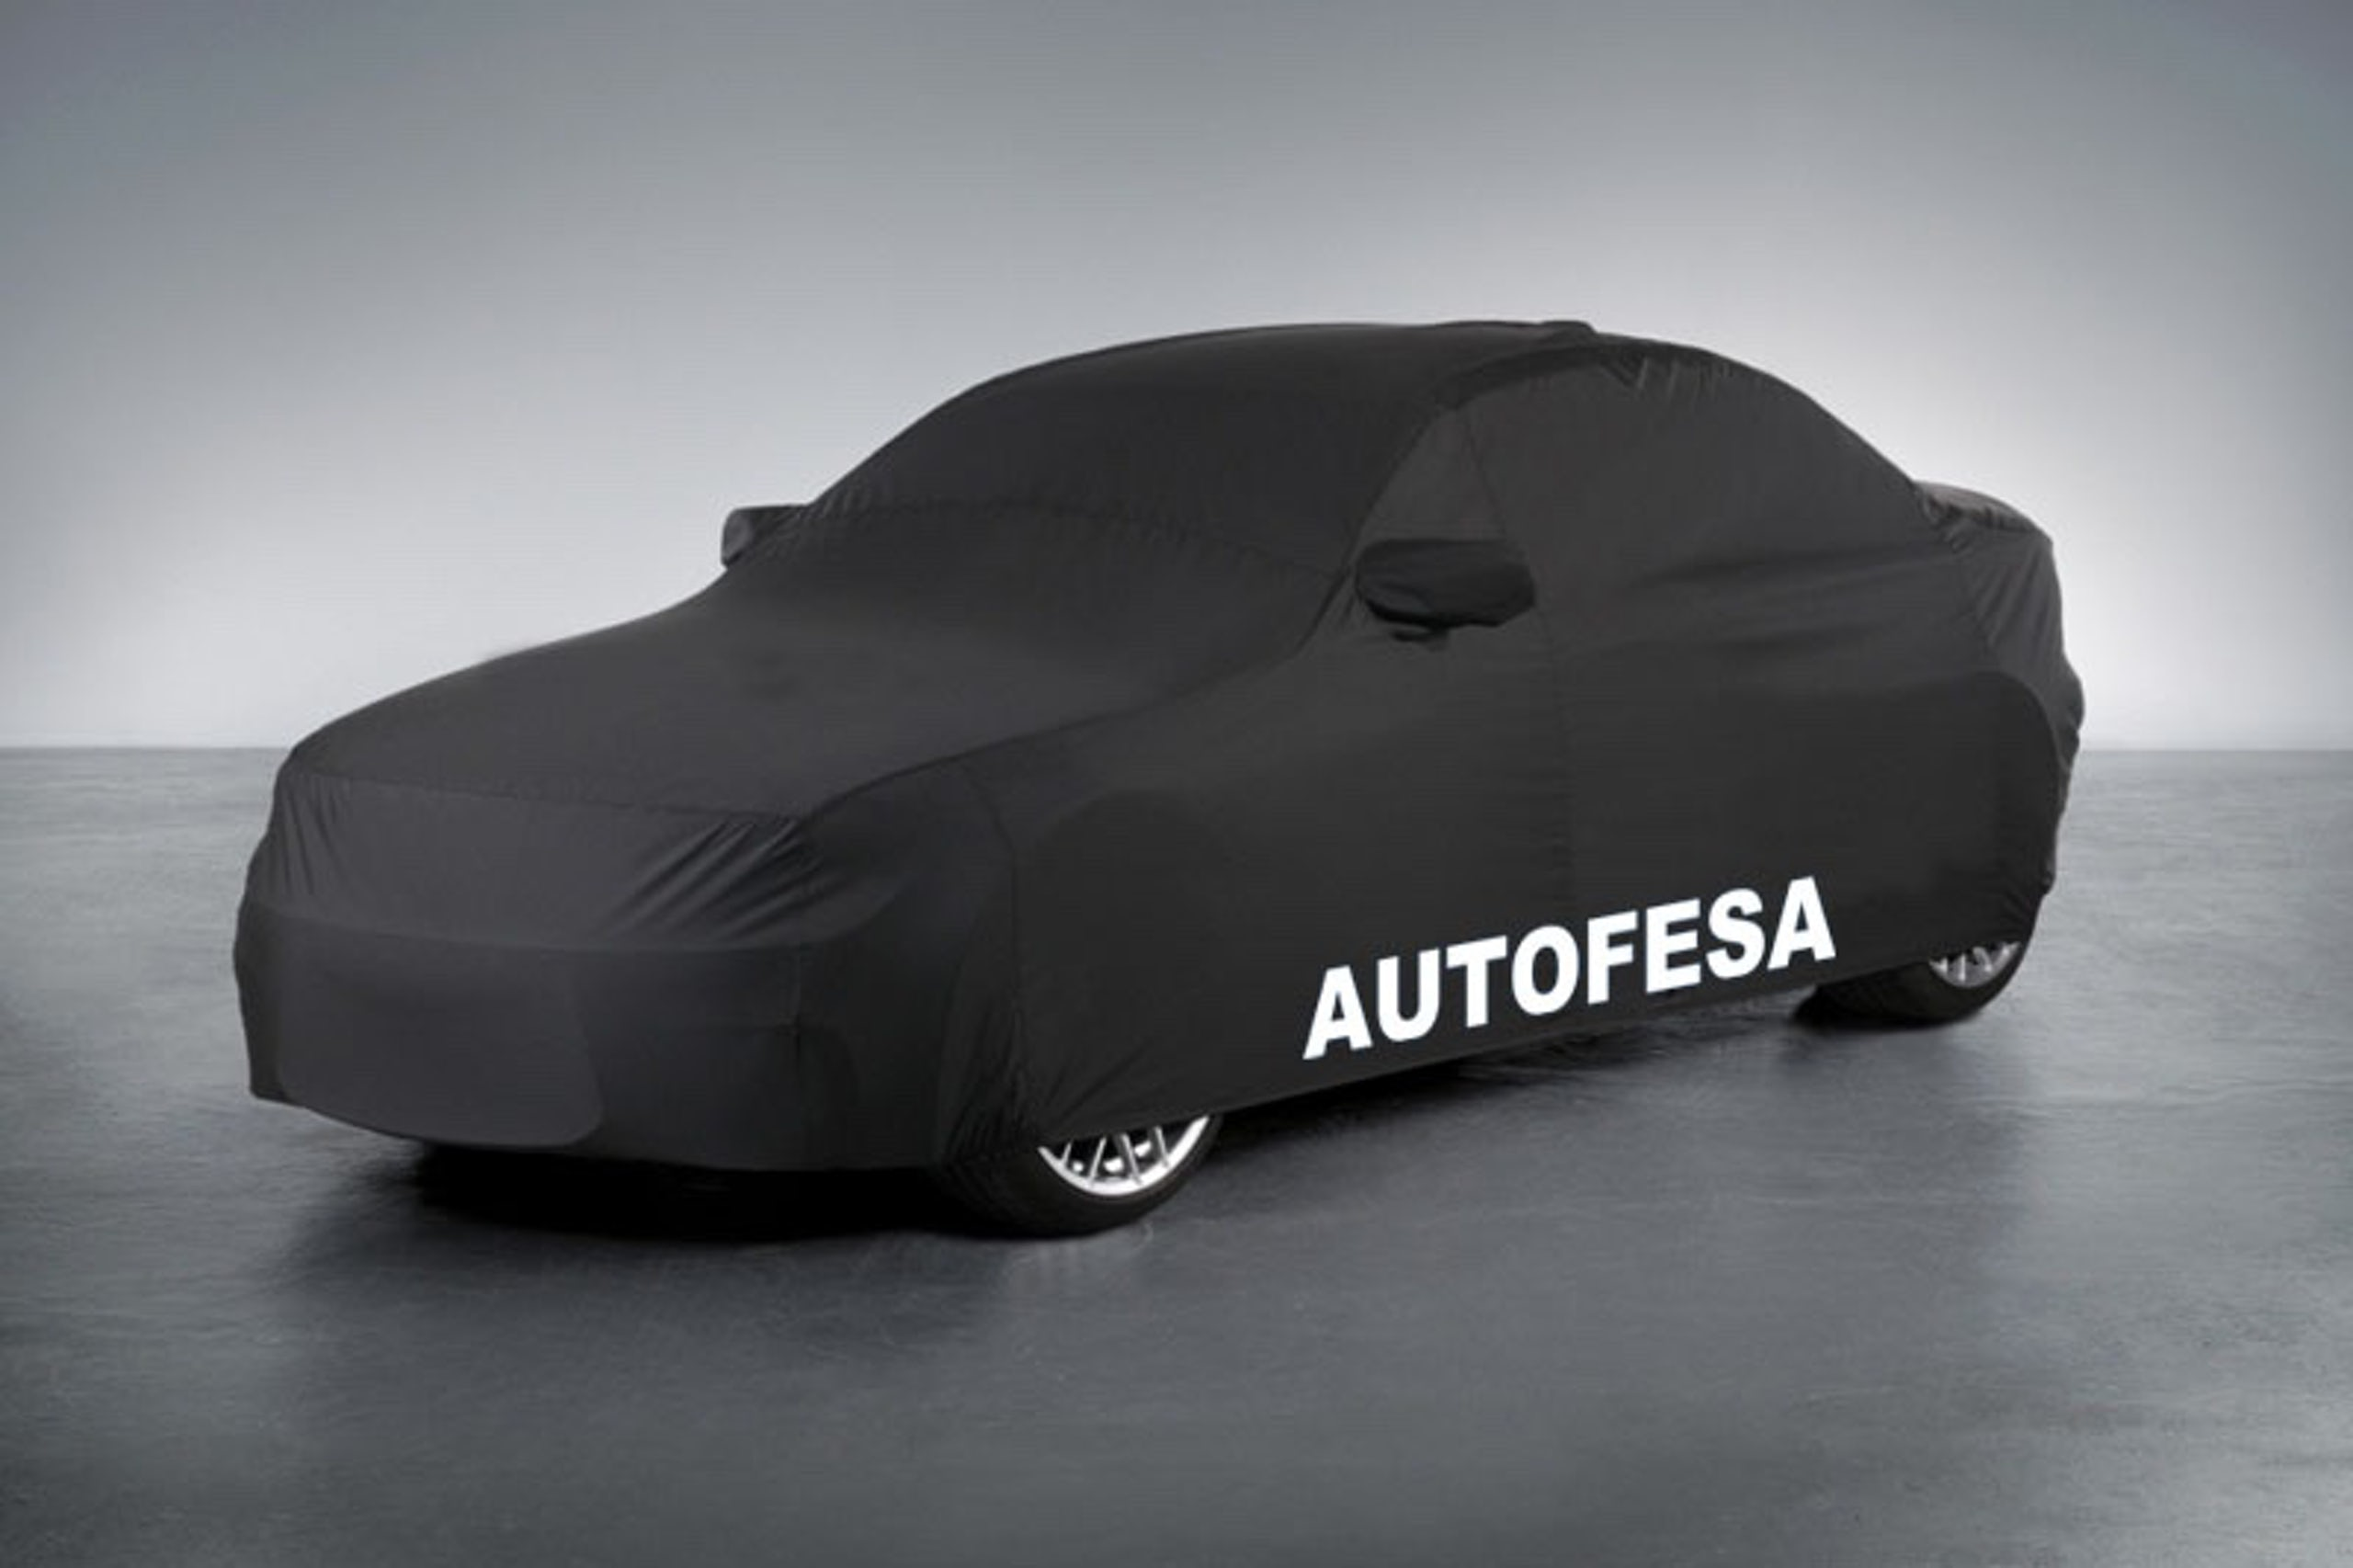 Audi Allroad 2.0 TFSI 252cv quattro 5p S tronic Auto S/S - Foto 2